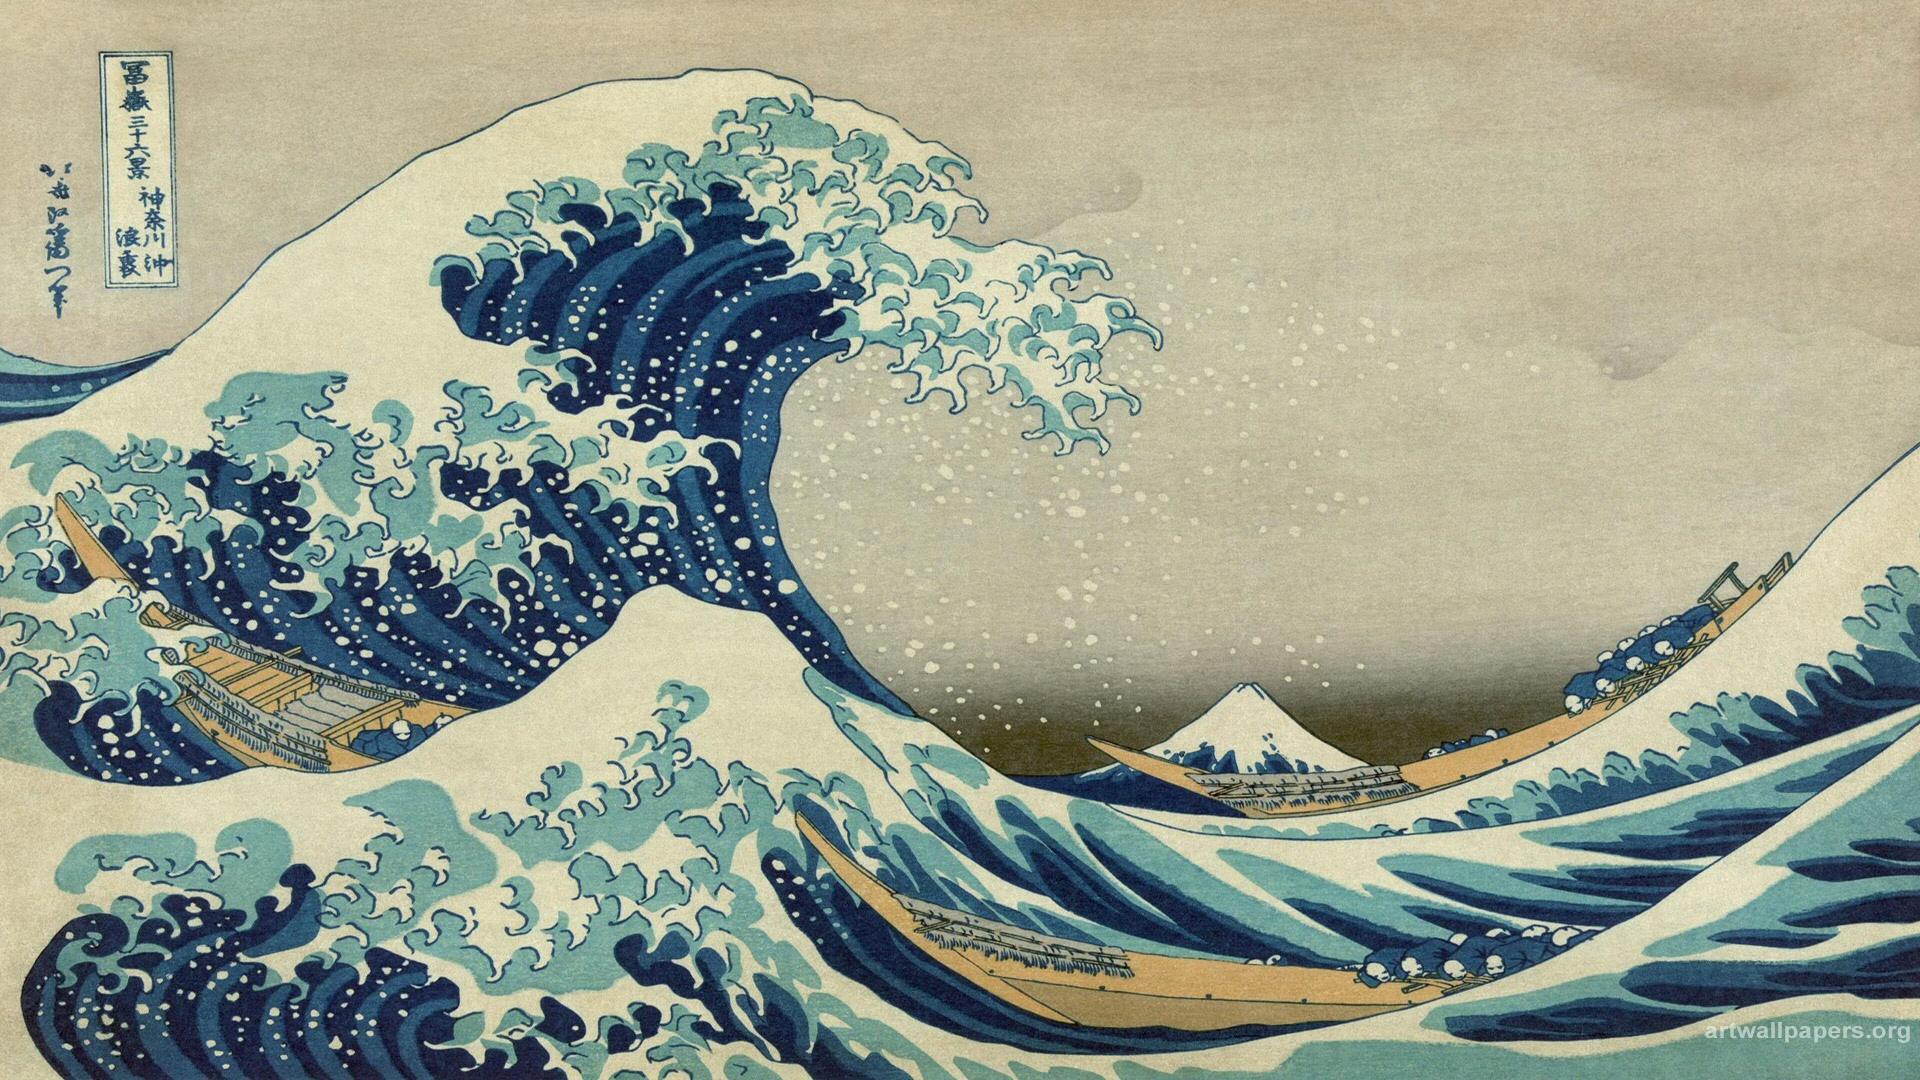 Hokusai Katsushika Wallpaper Art Wallpapers Widescreen 1920x1080